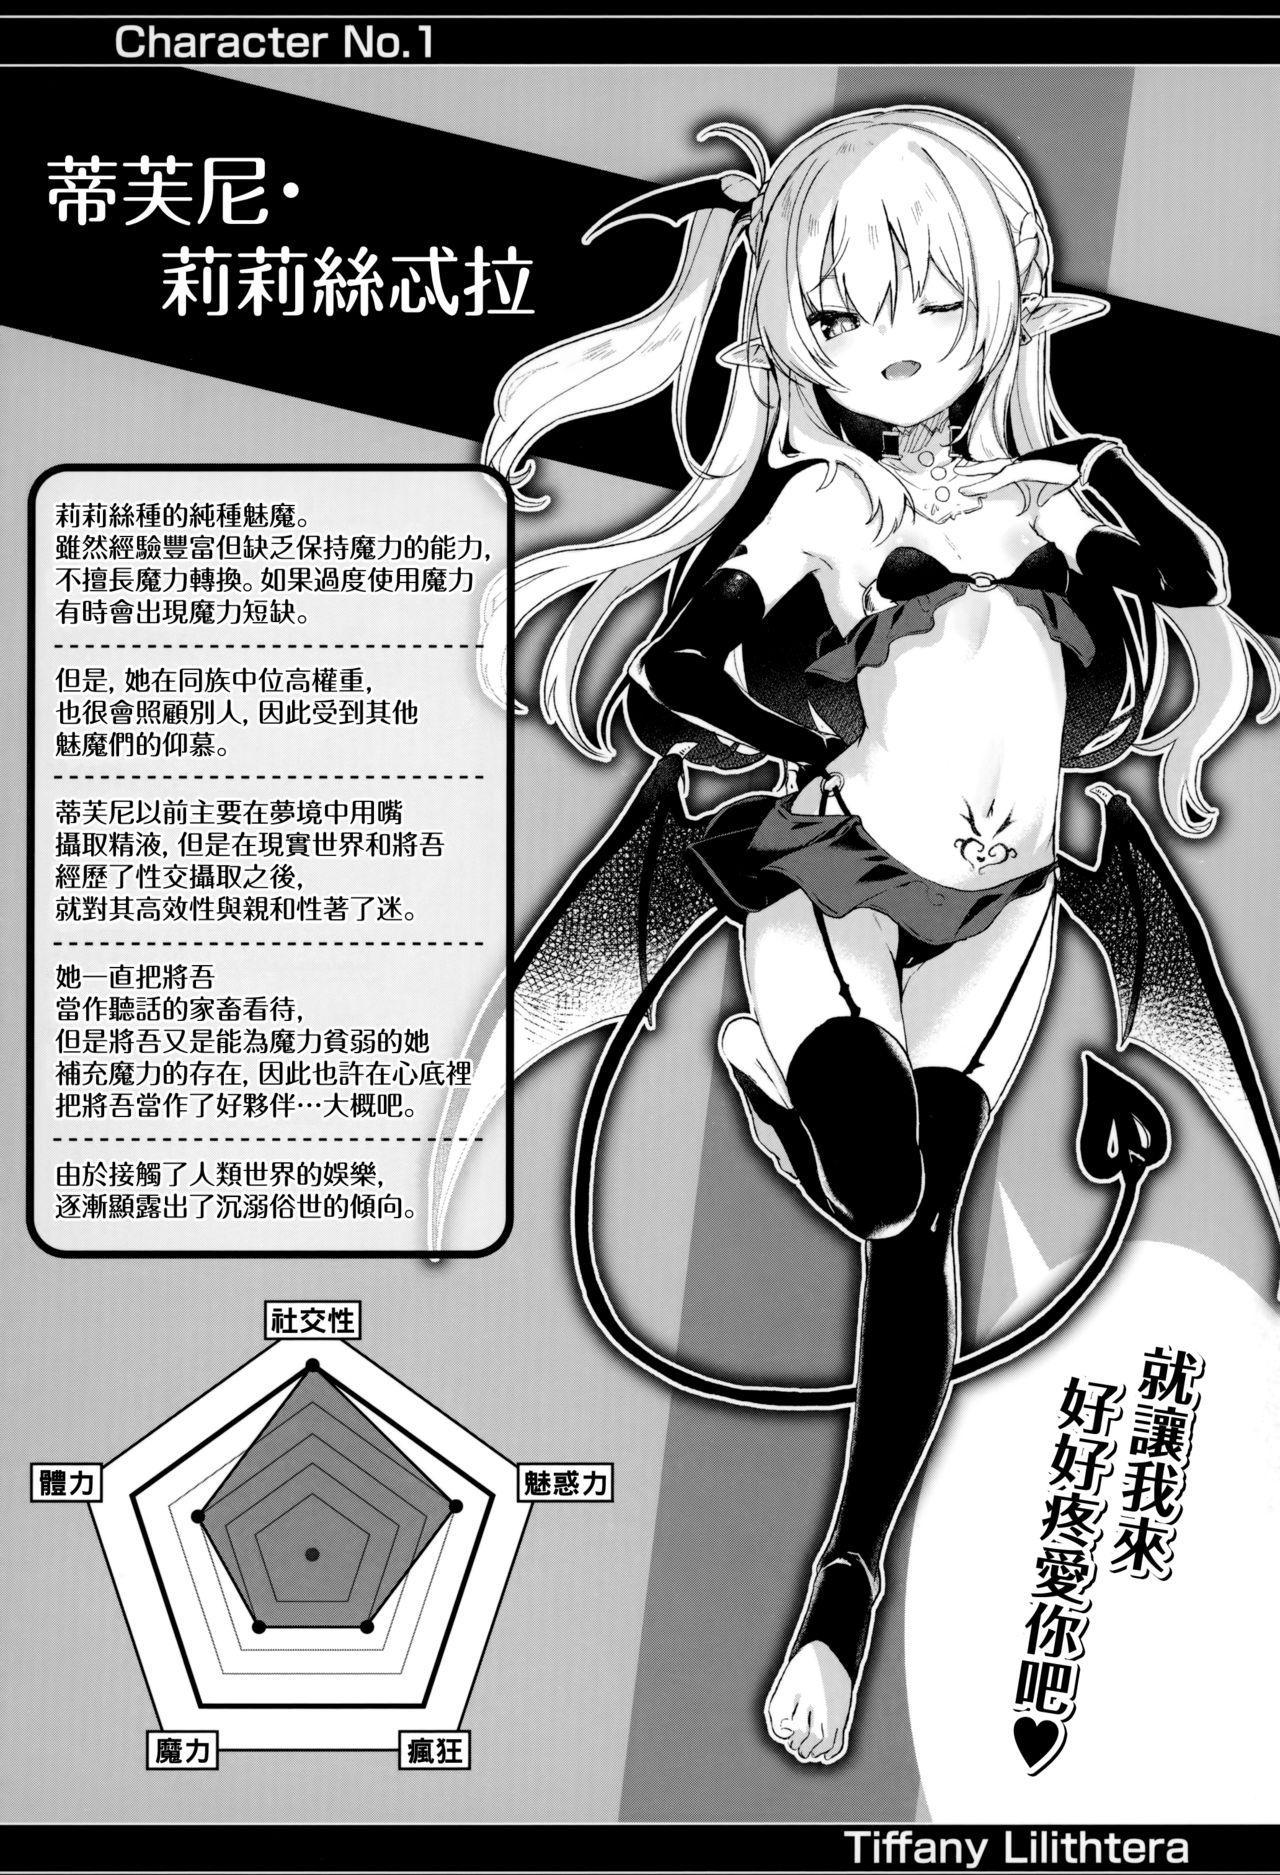 Boku wa Chiisana Succubus no Shimobe - I am a slave of a small succubus 80